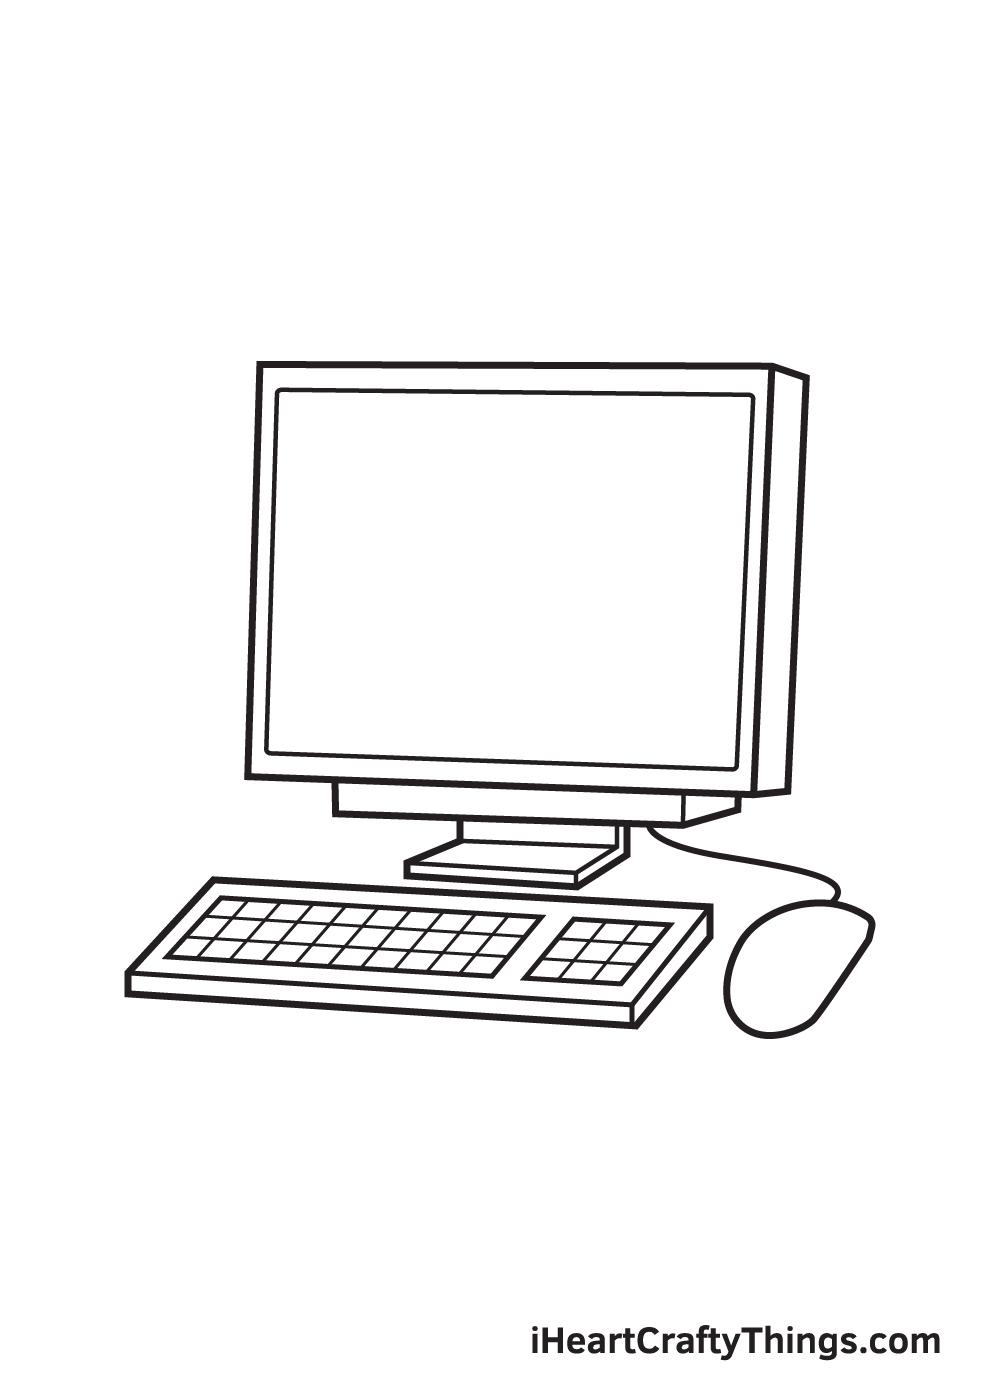 computer drawing - step 7